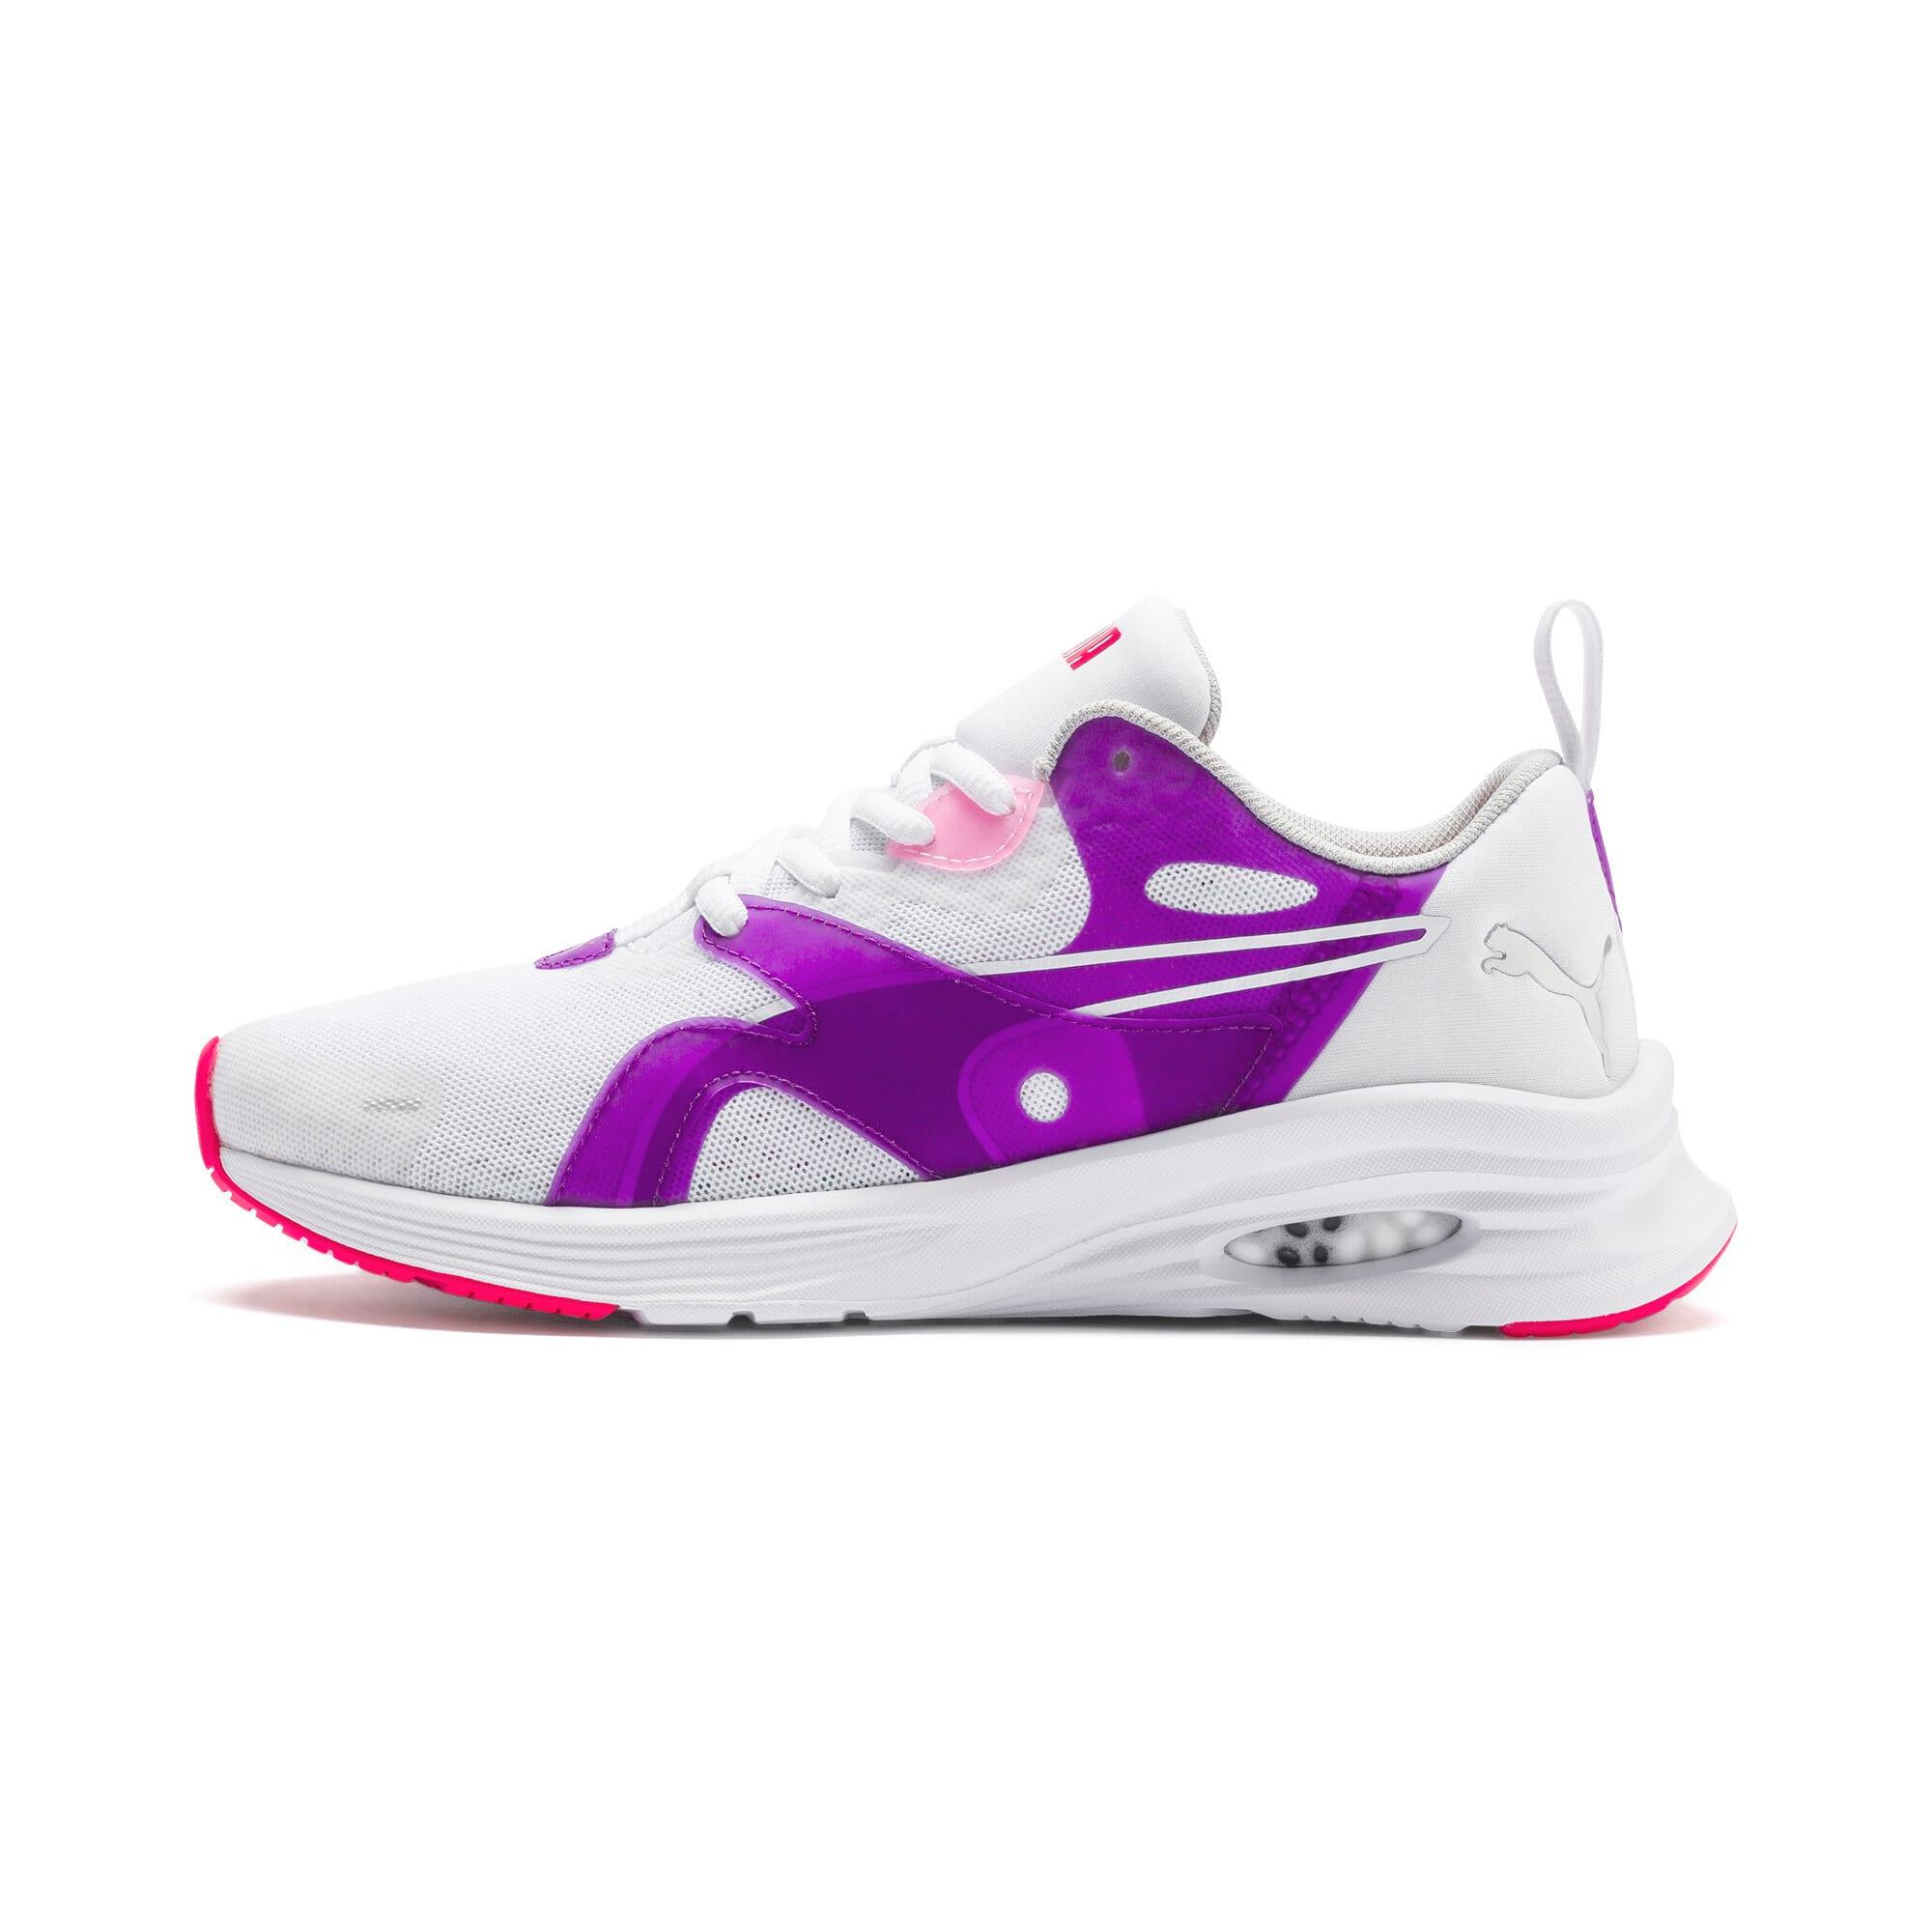 Thumbnail 1 of HYBRID Fuego Running Shoes JR, Puma White-Royal Lilac, medium